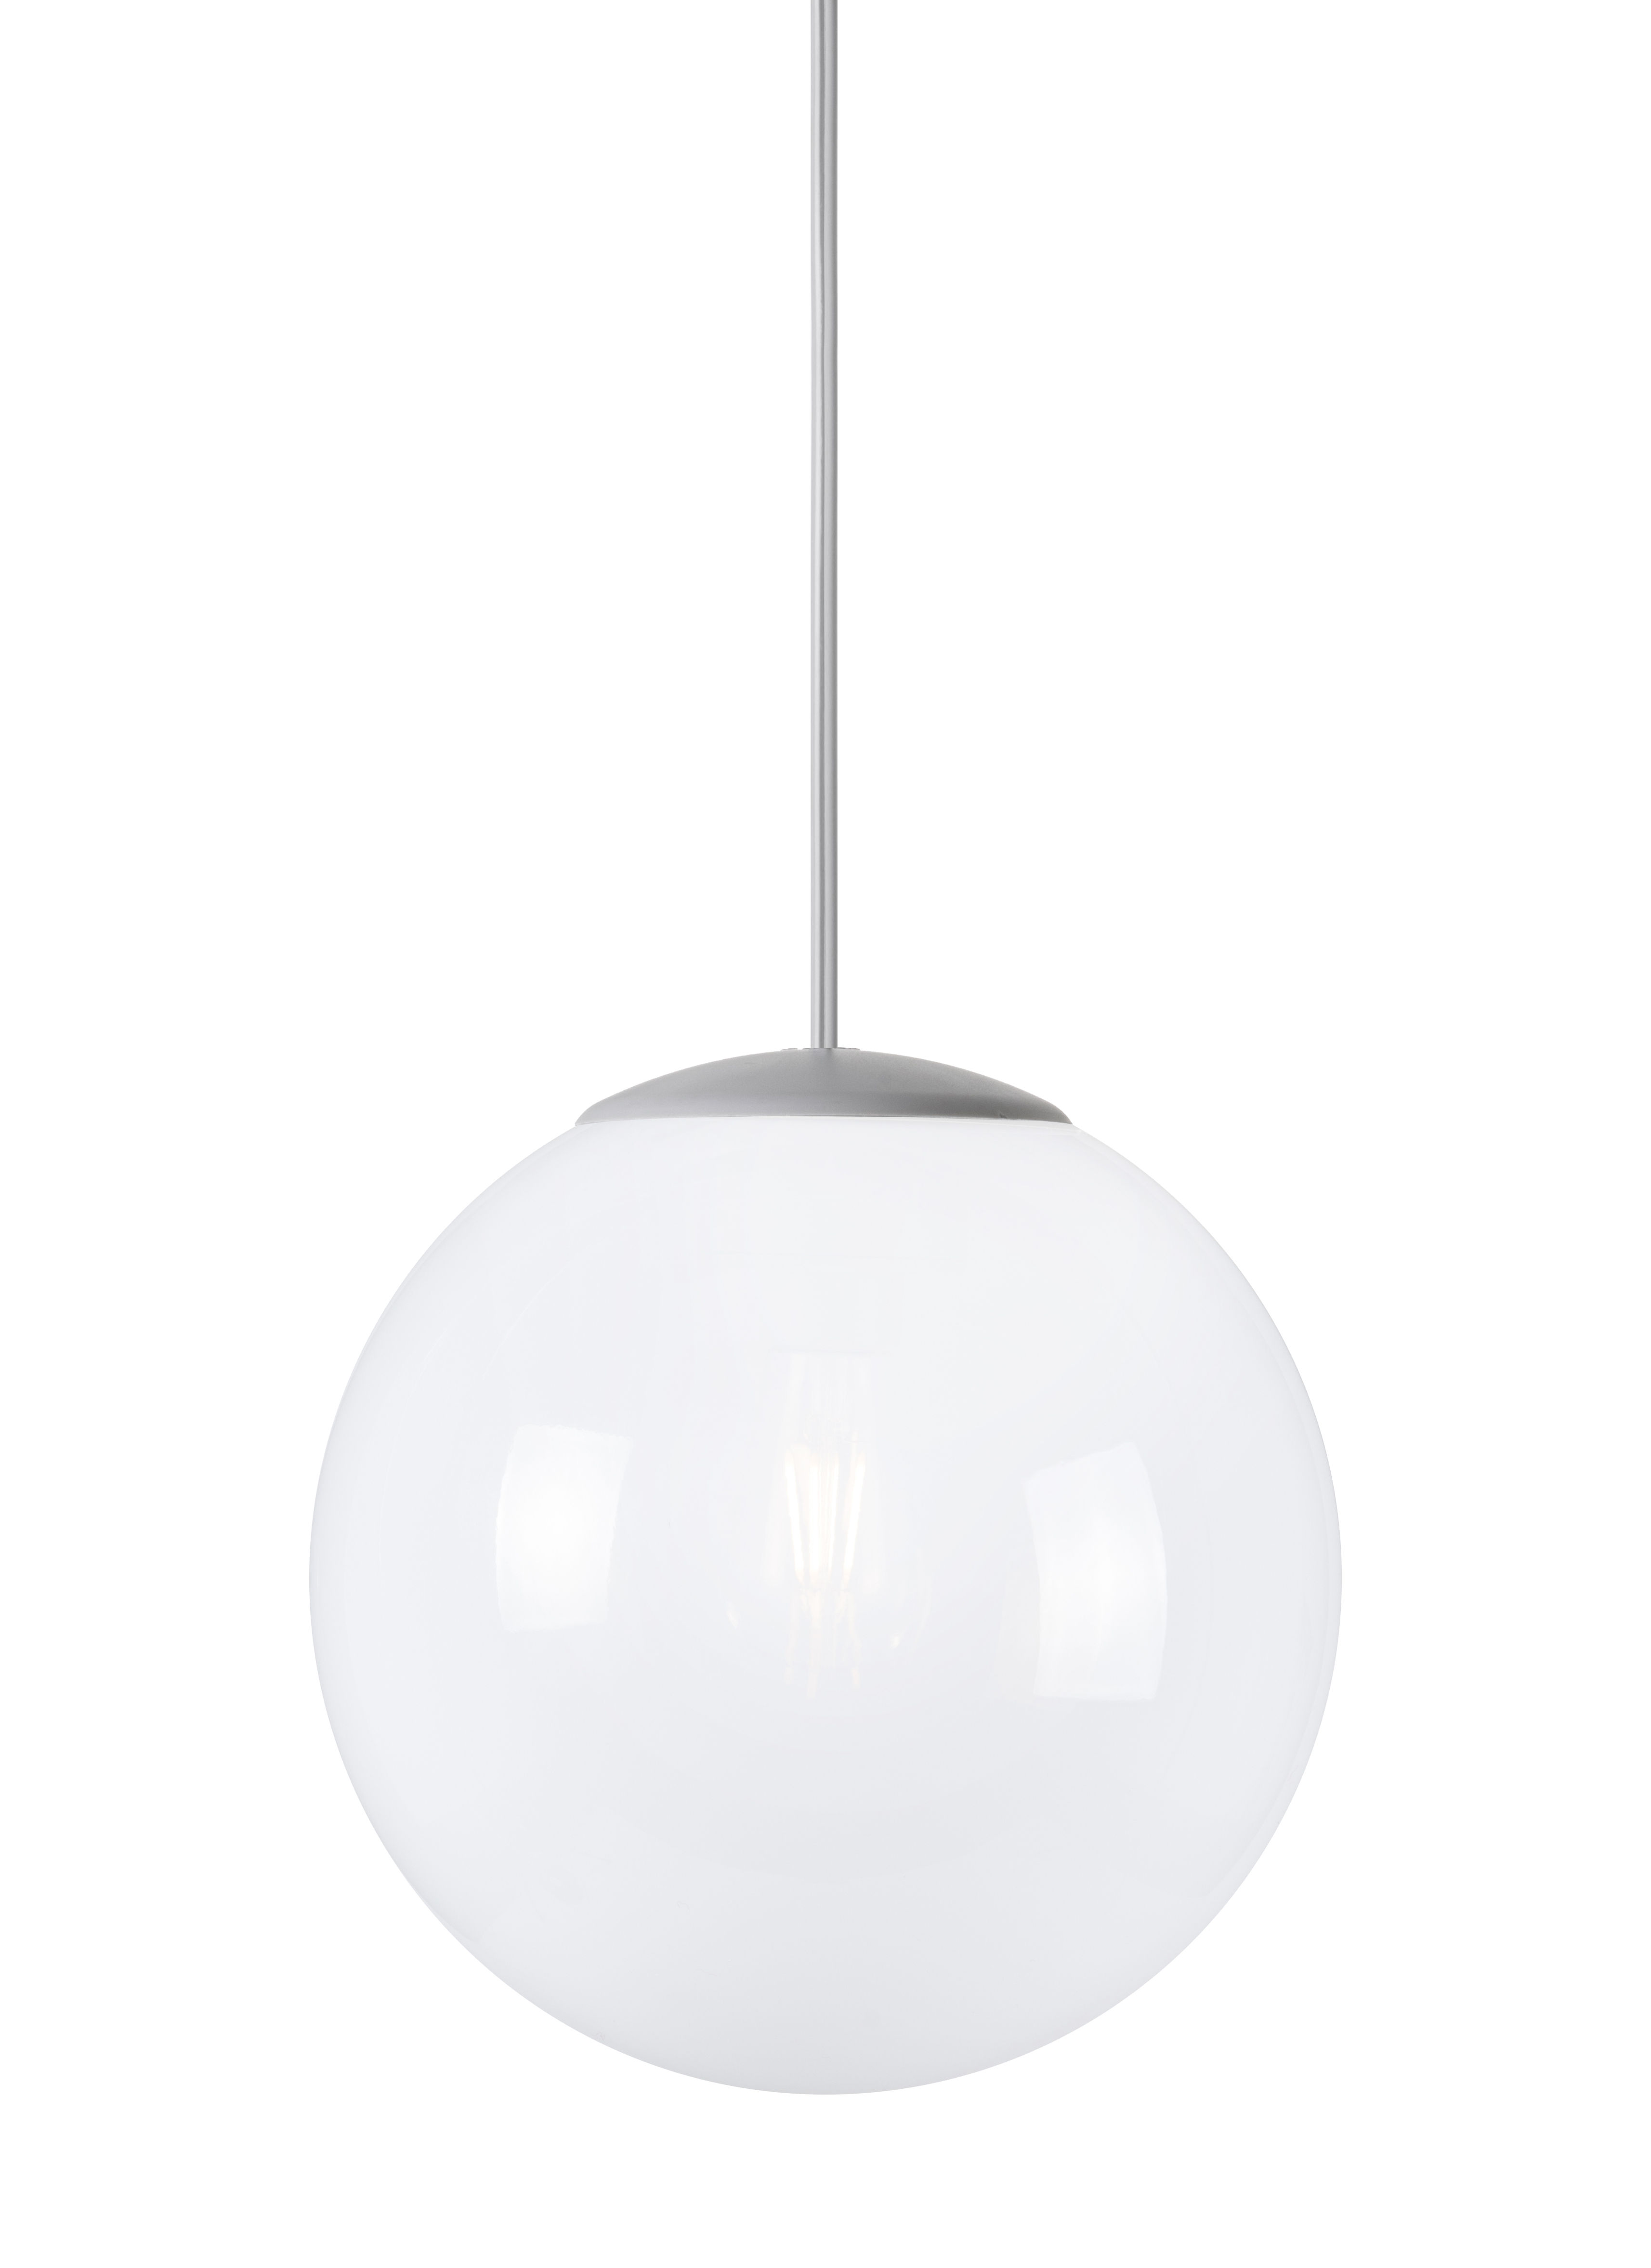 Luminaire Ozcan Elegant Les Plus Demands With Luminaire Ozcan